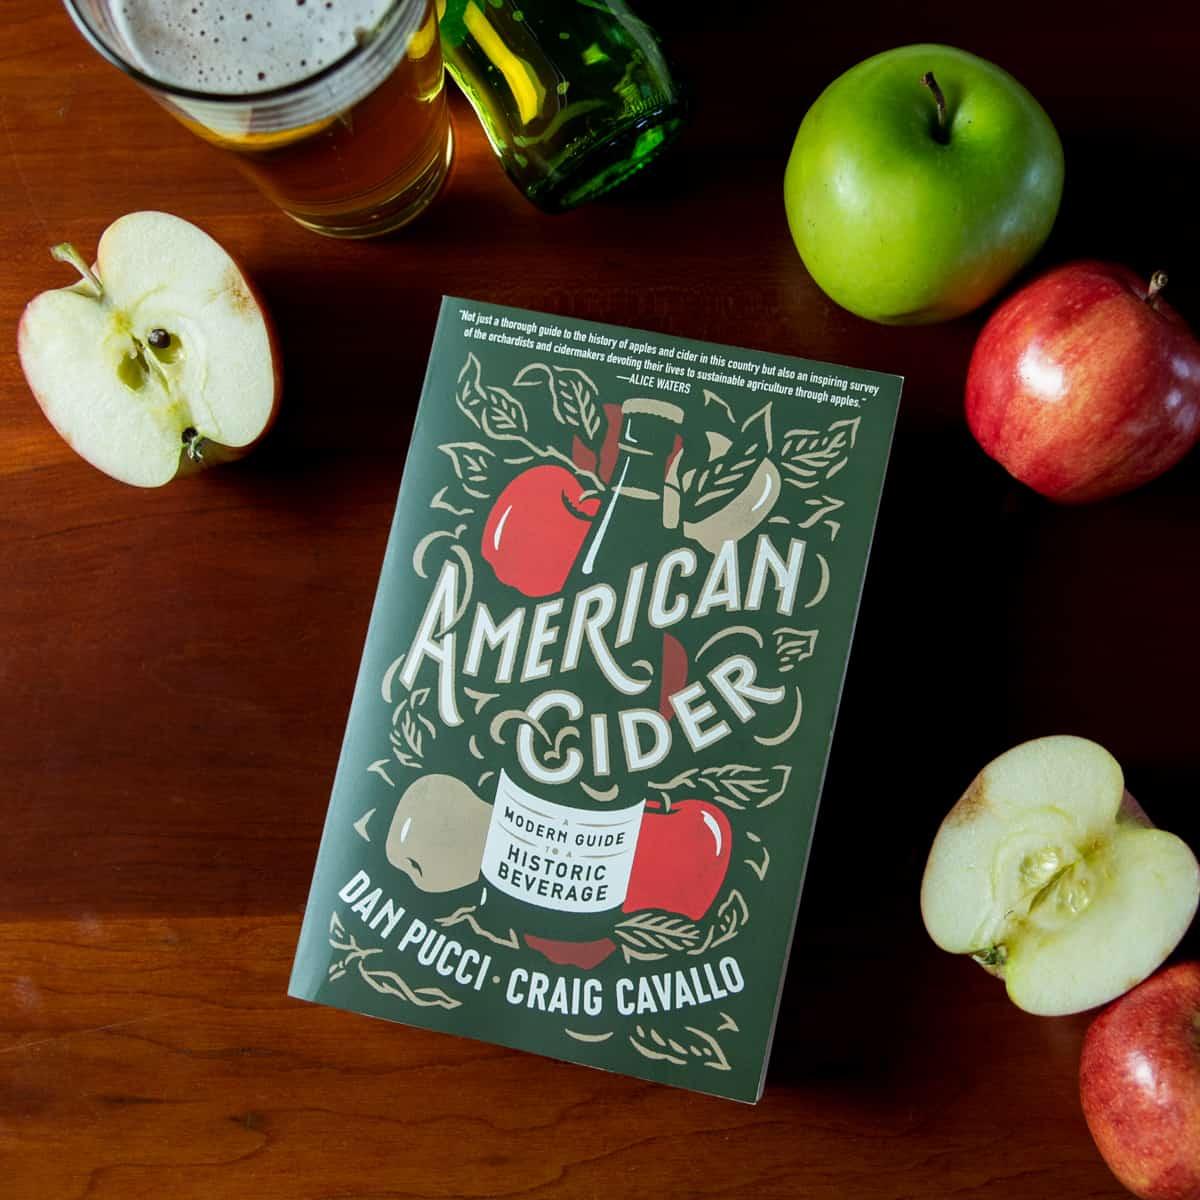 American Cider book